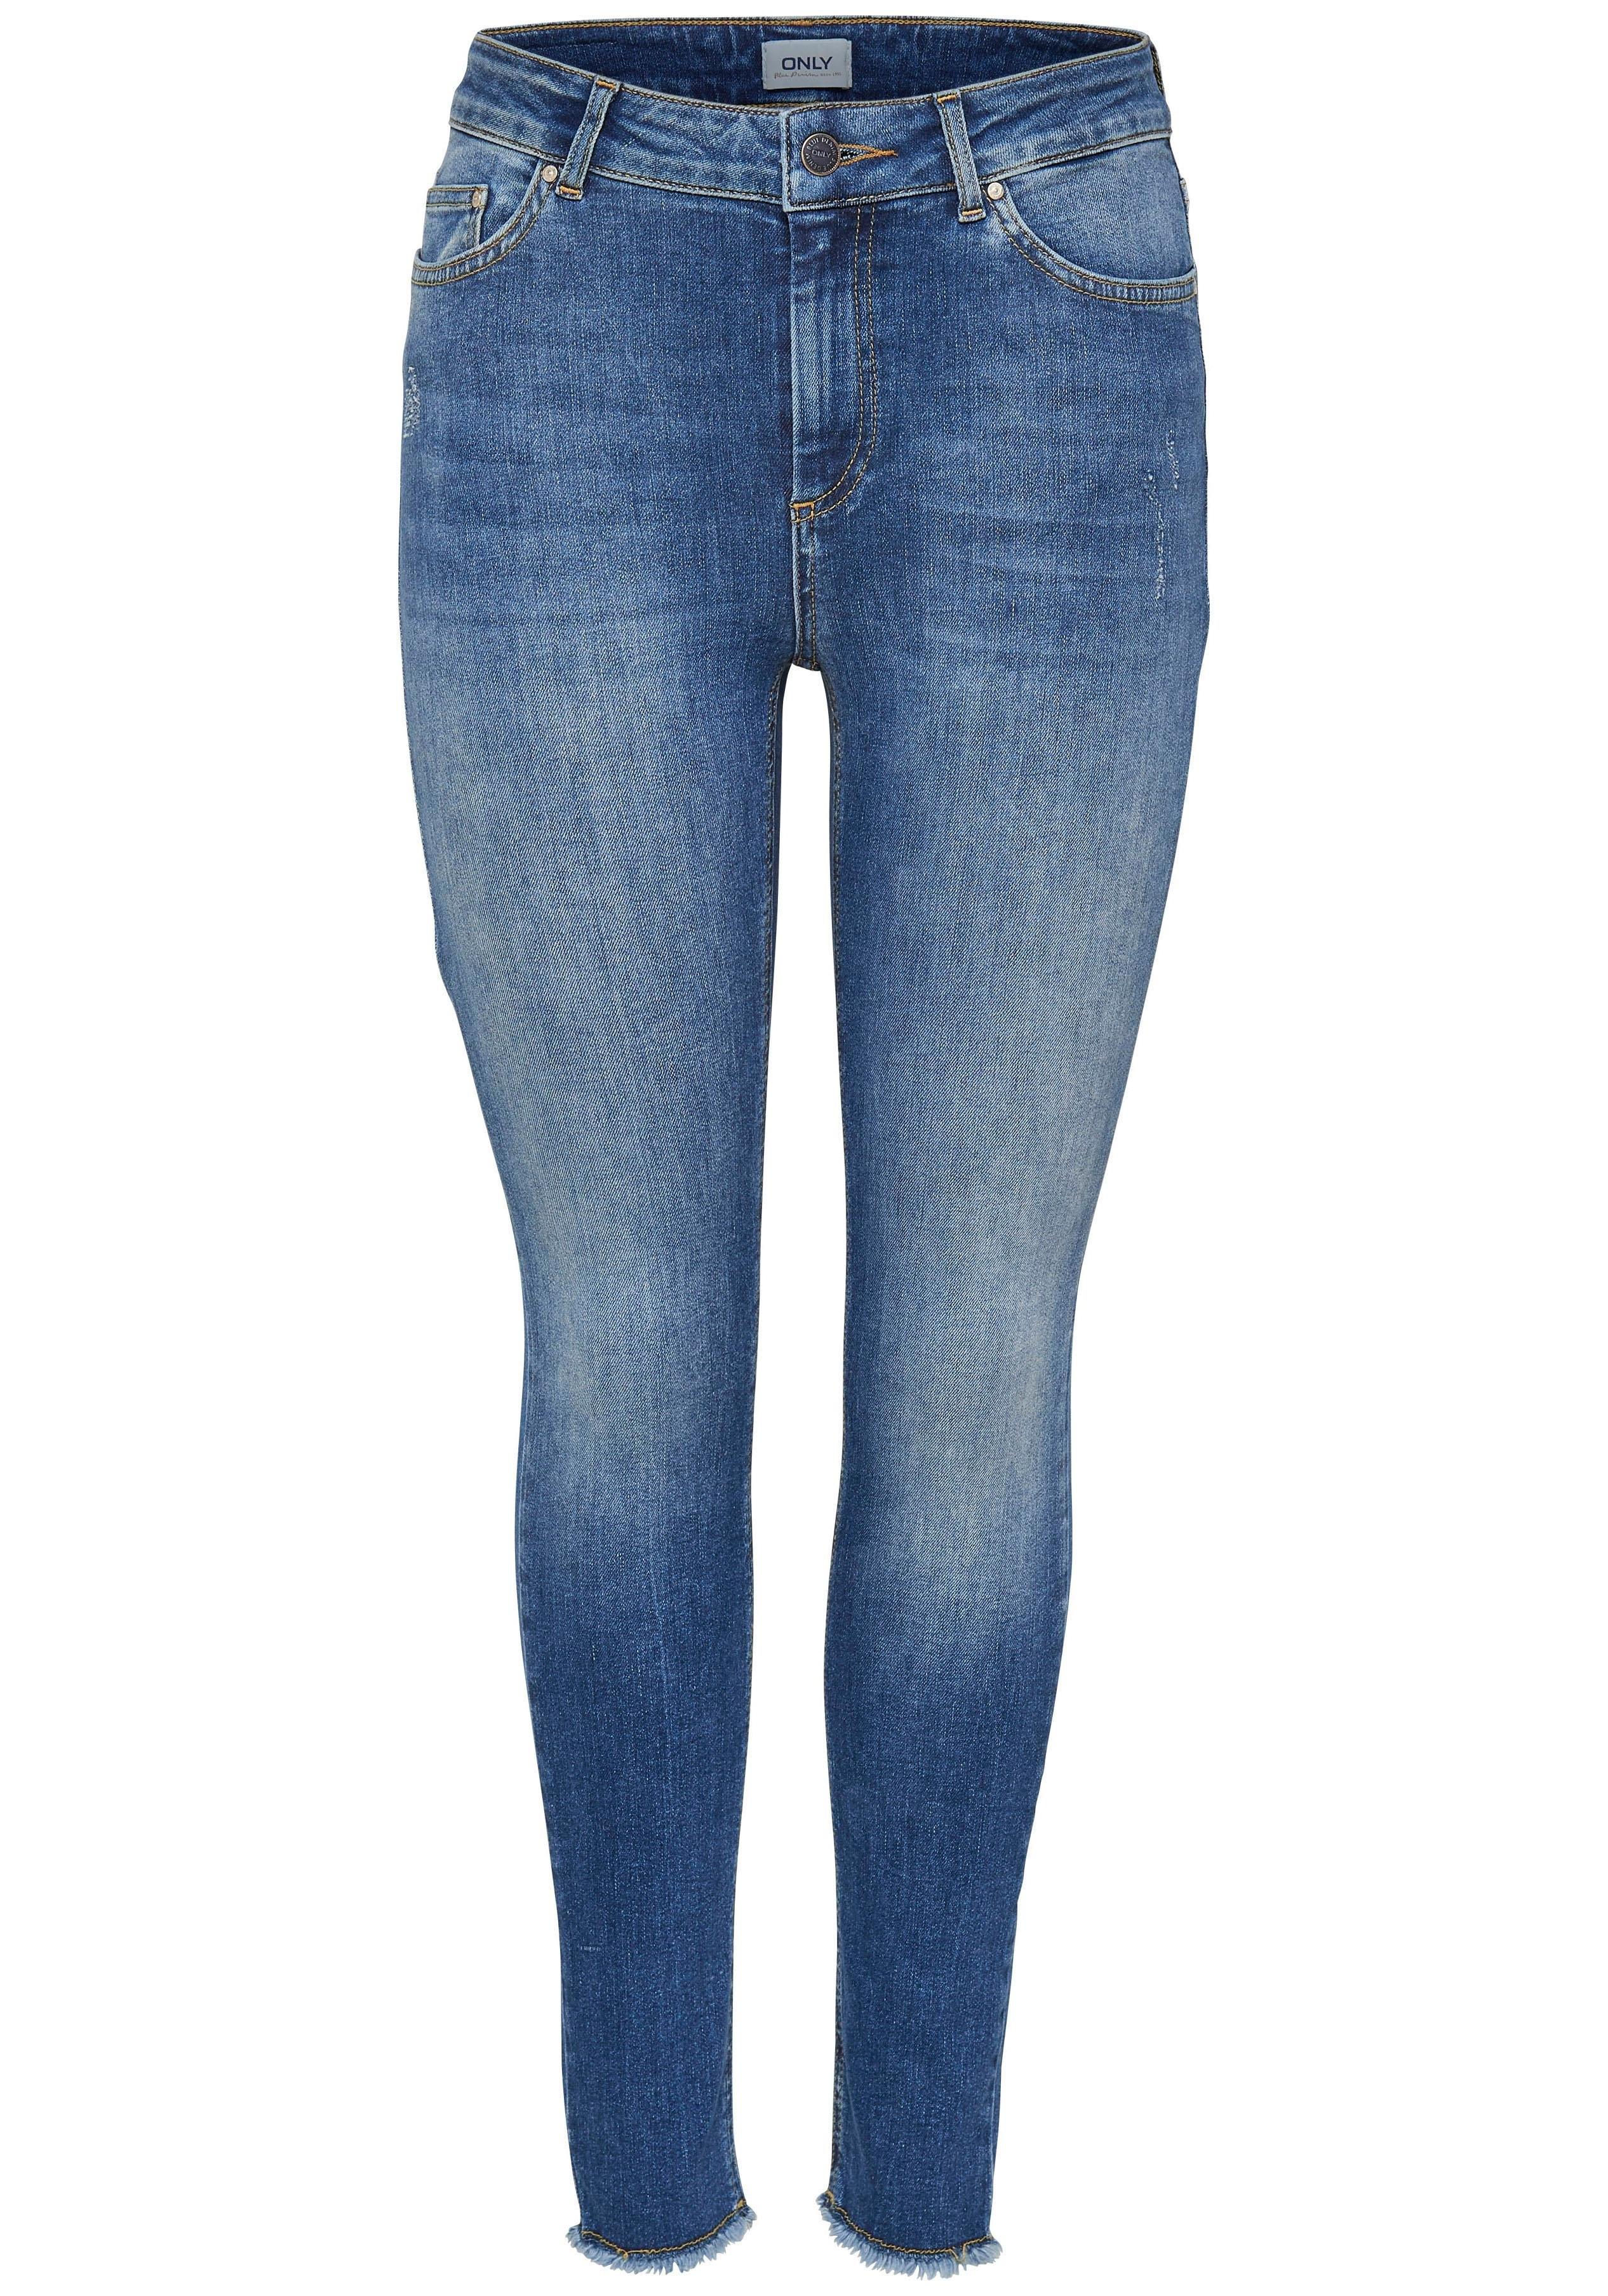 ONLY ankle jeans »BLUSH« goedkoop op otto.nl kopen